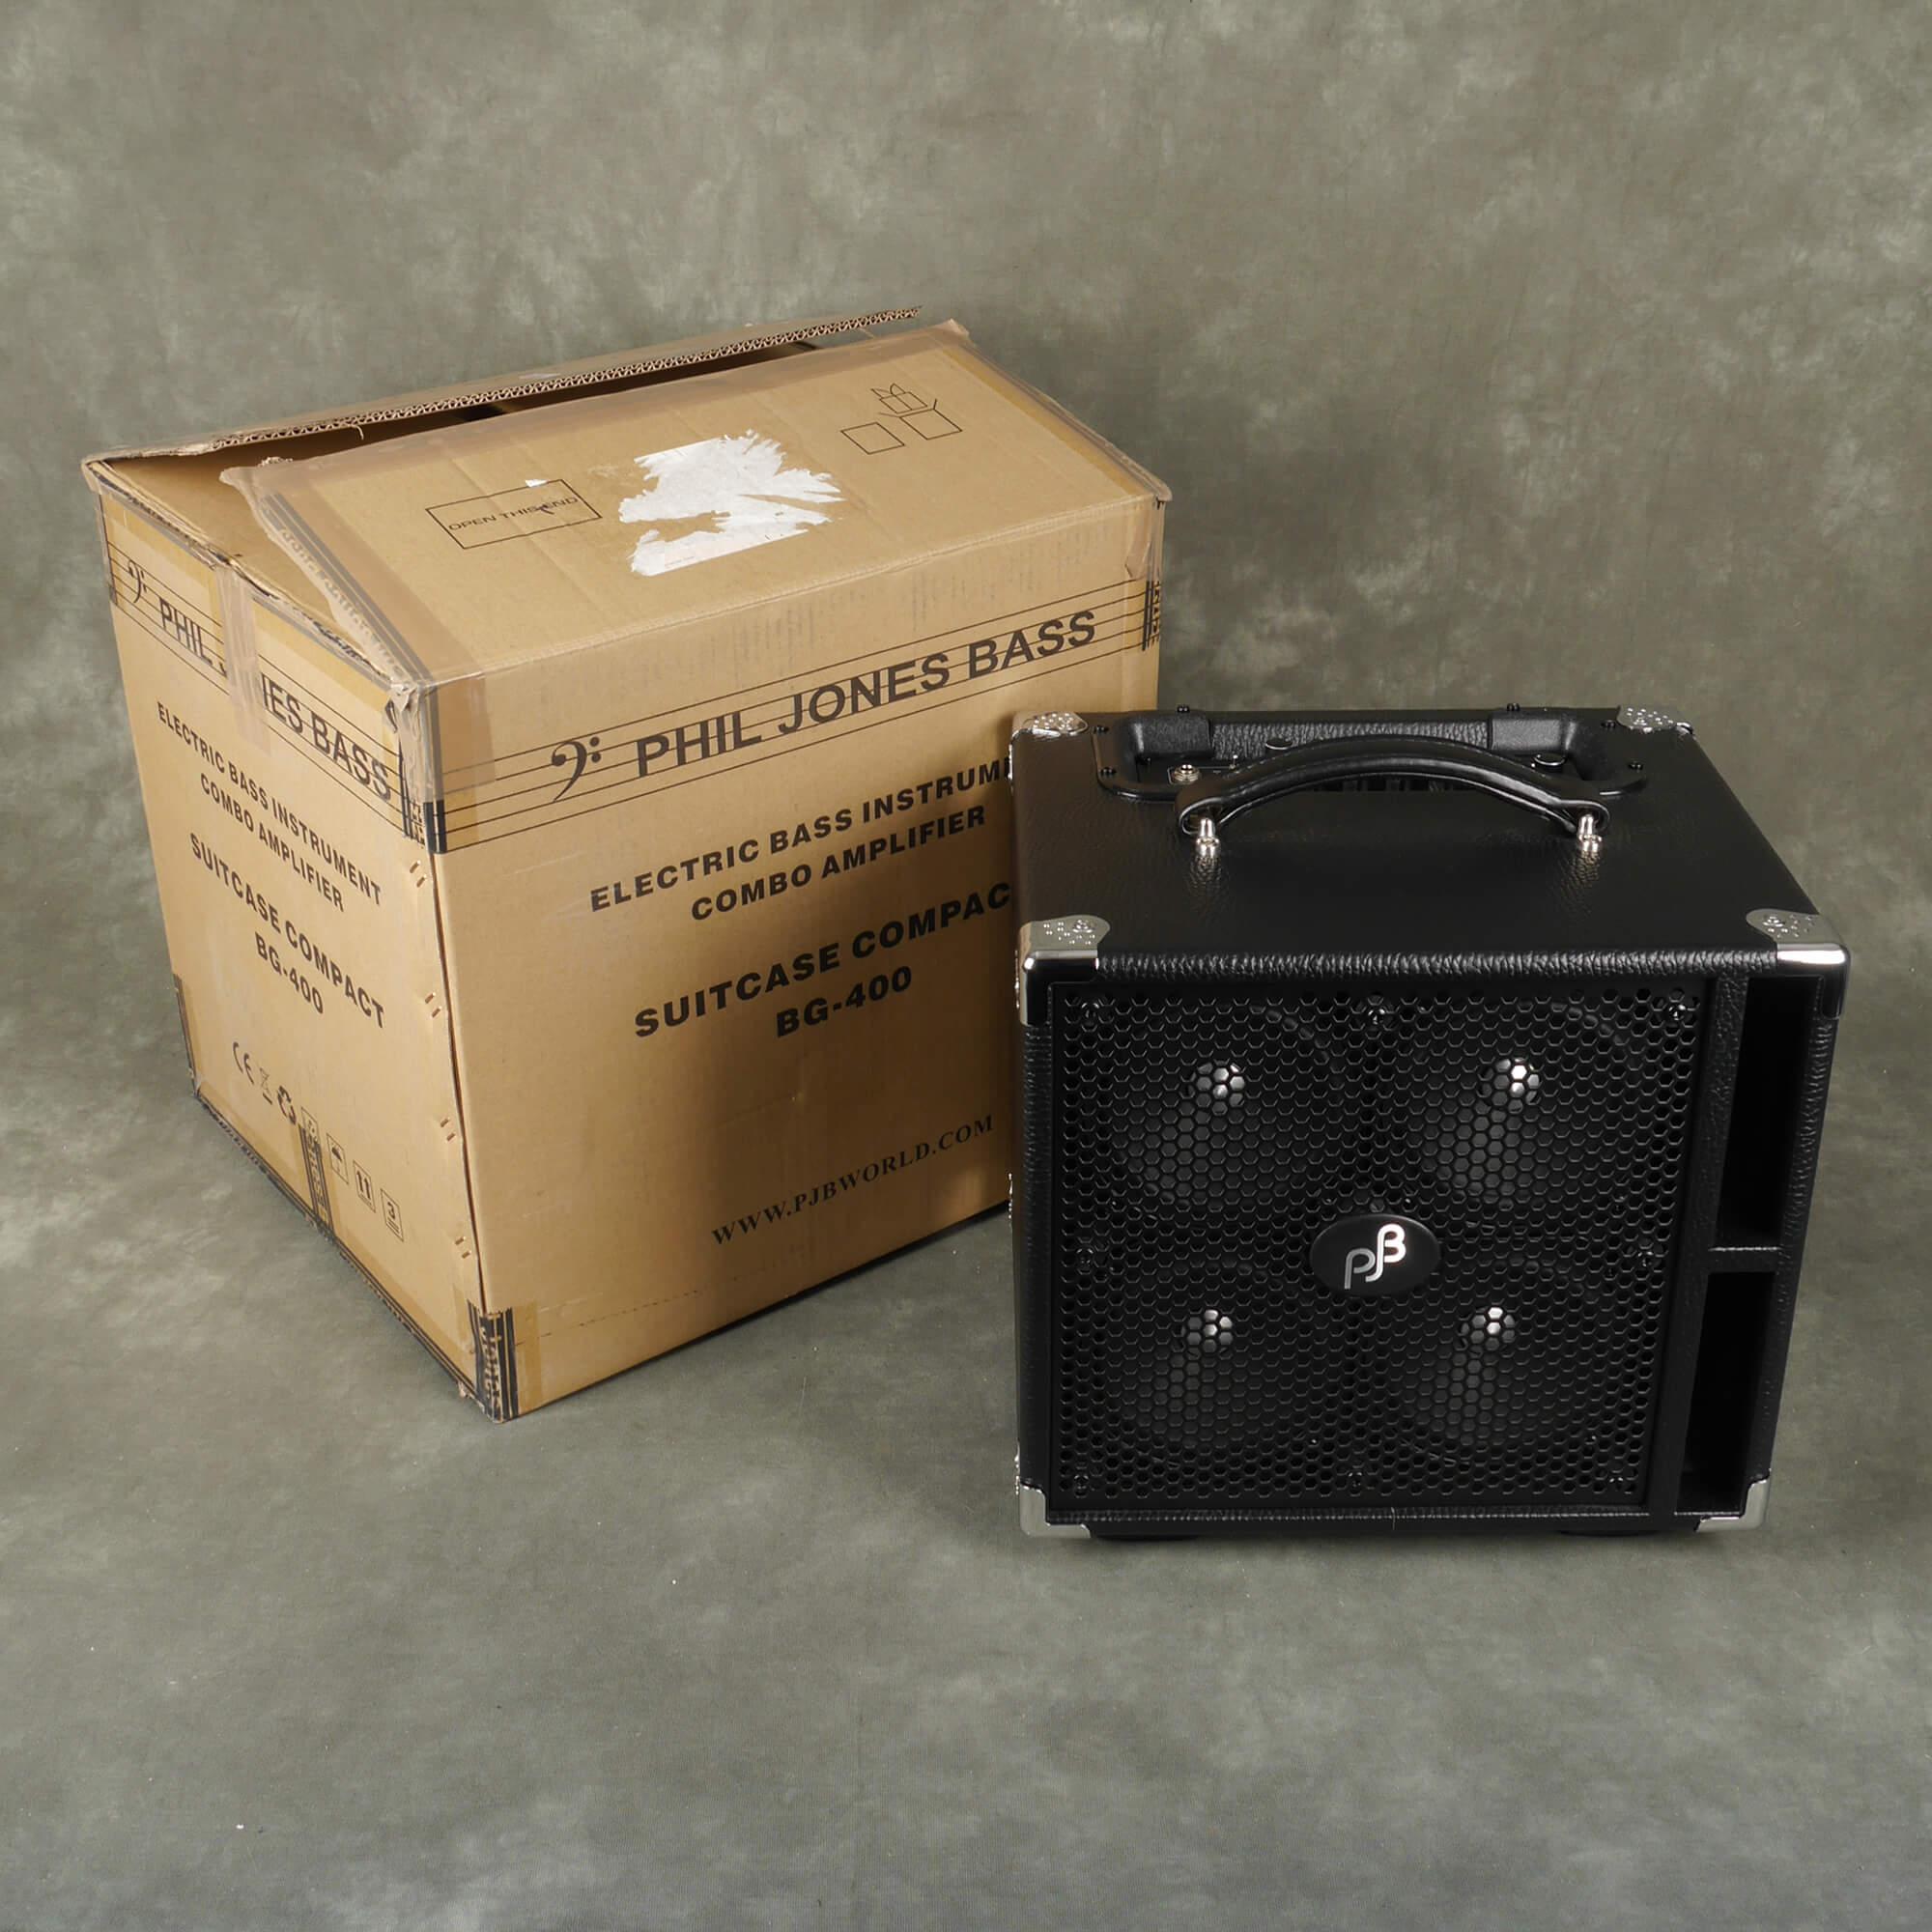 Phil Jones BG-400 Suitcase Compact Amp w/Box - 2nd Hand